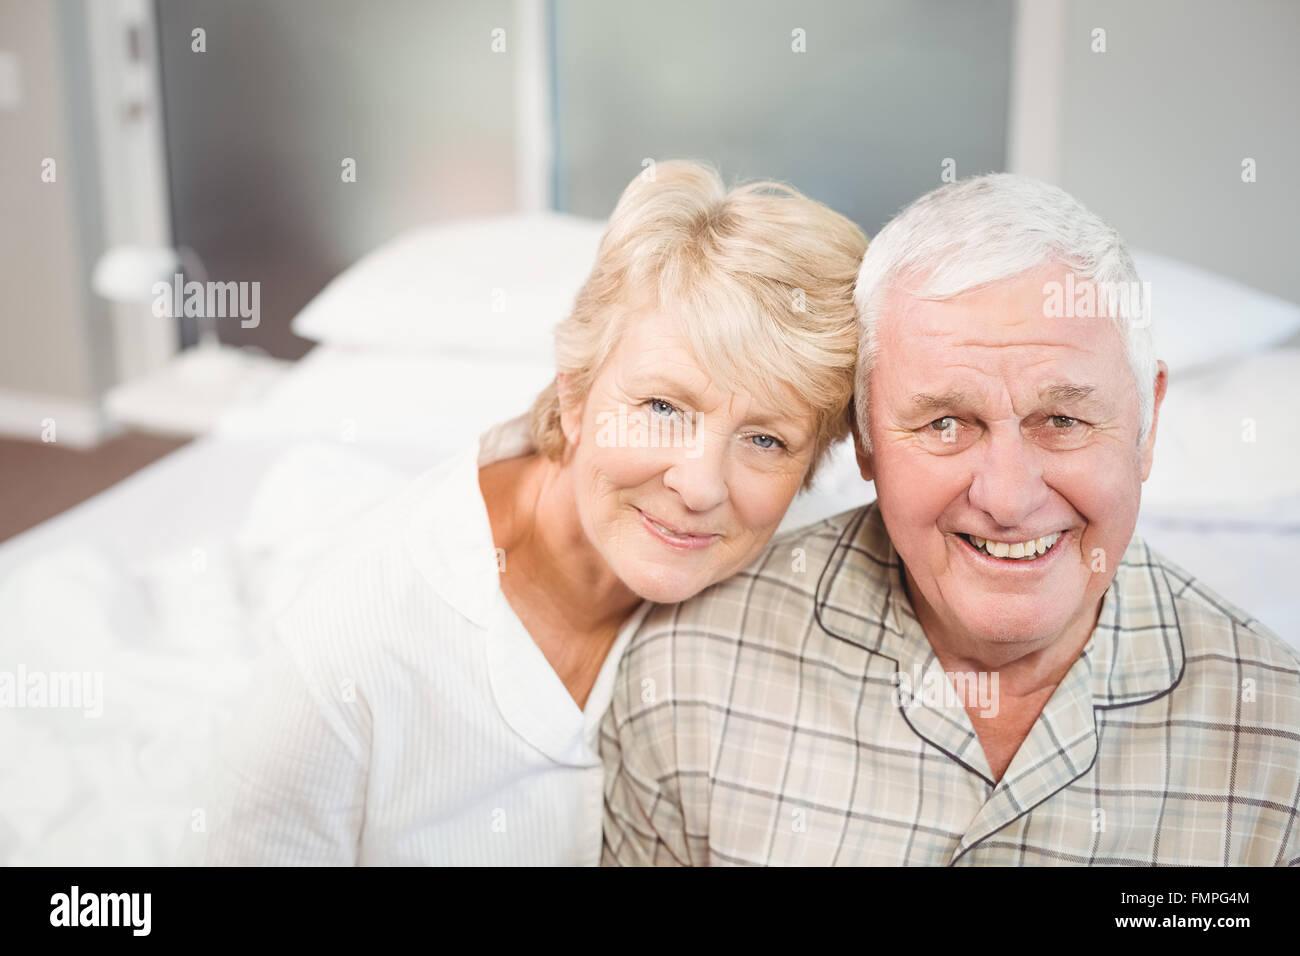 Portrait of happy senior couple in nightwear - Stock Image